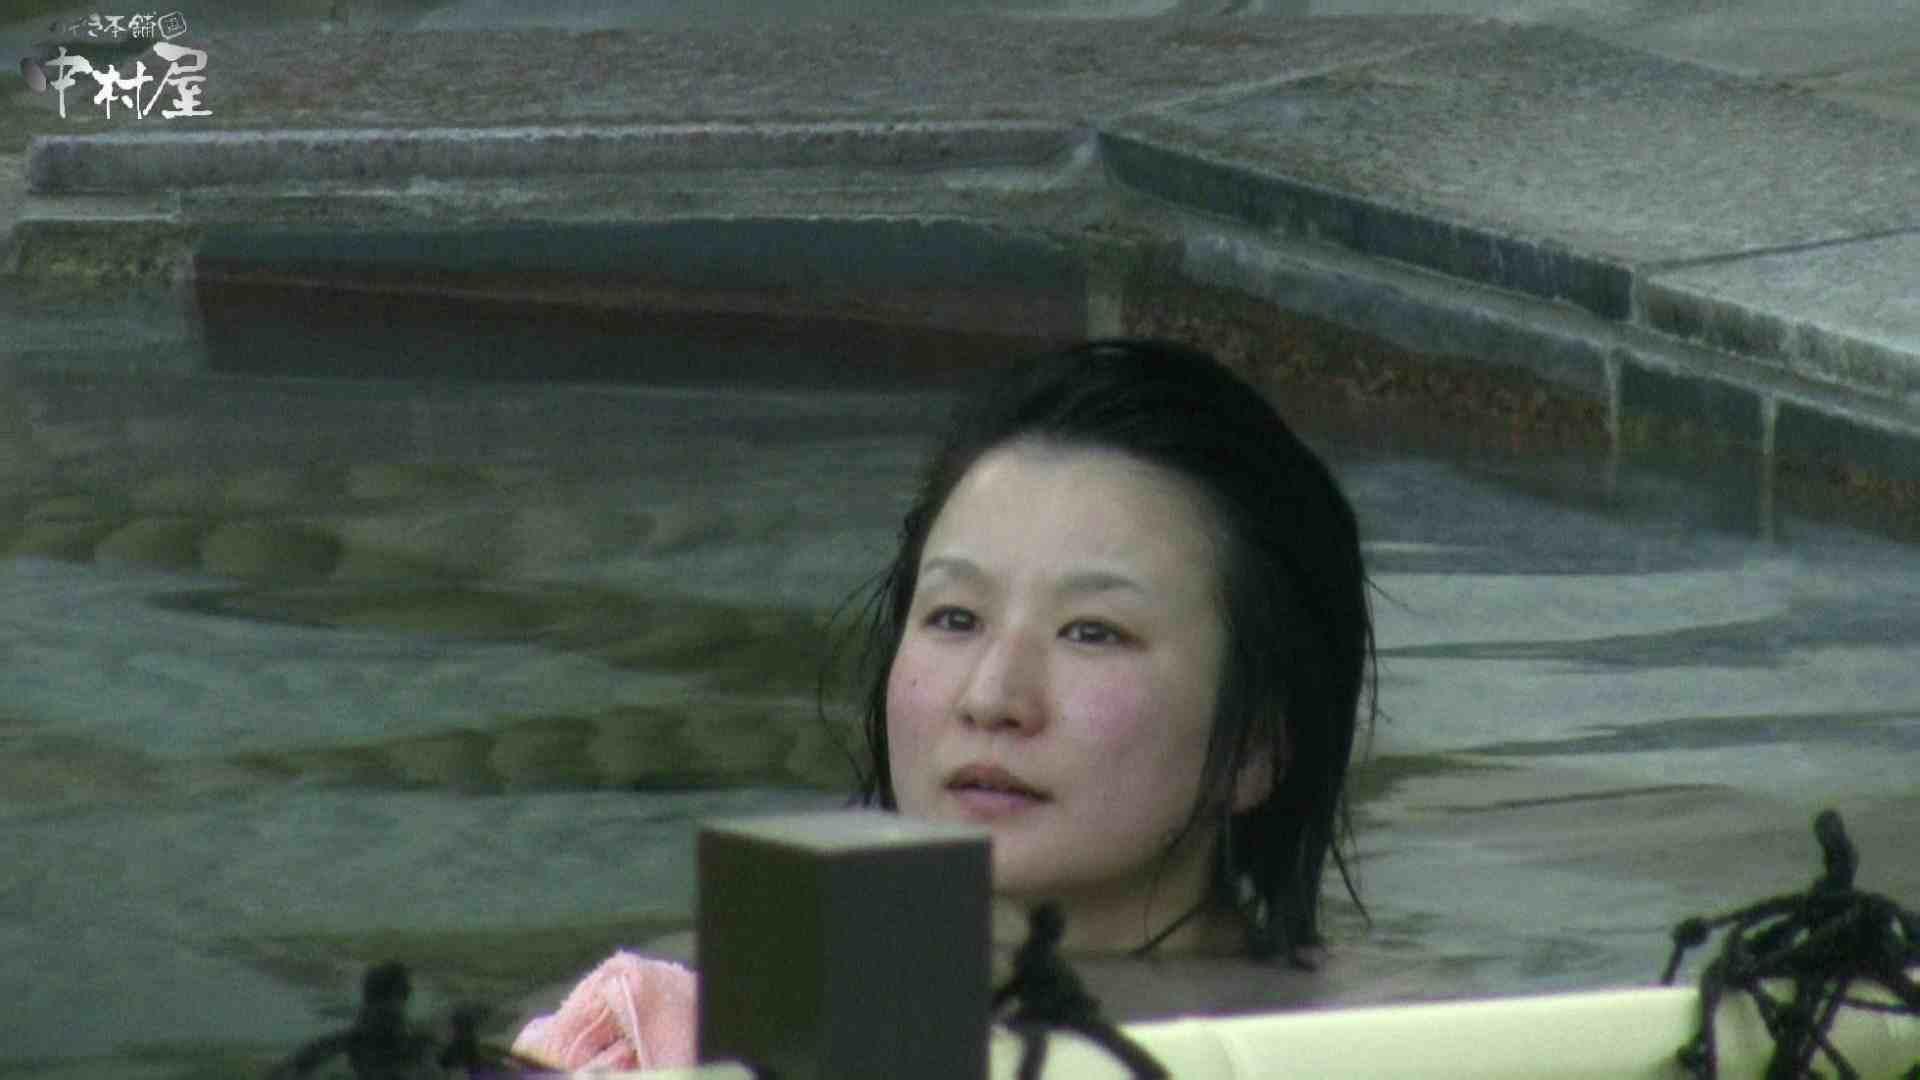 Aquaな露天風呂Vol.982 露天風呂編   盗撮シリーズ  78PIX 43